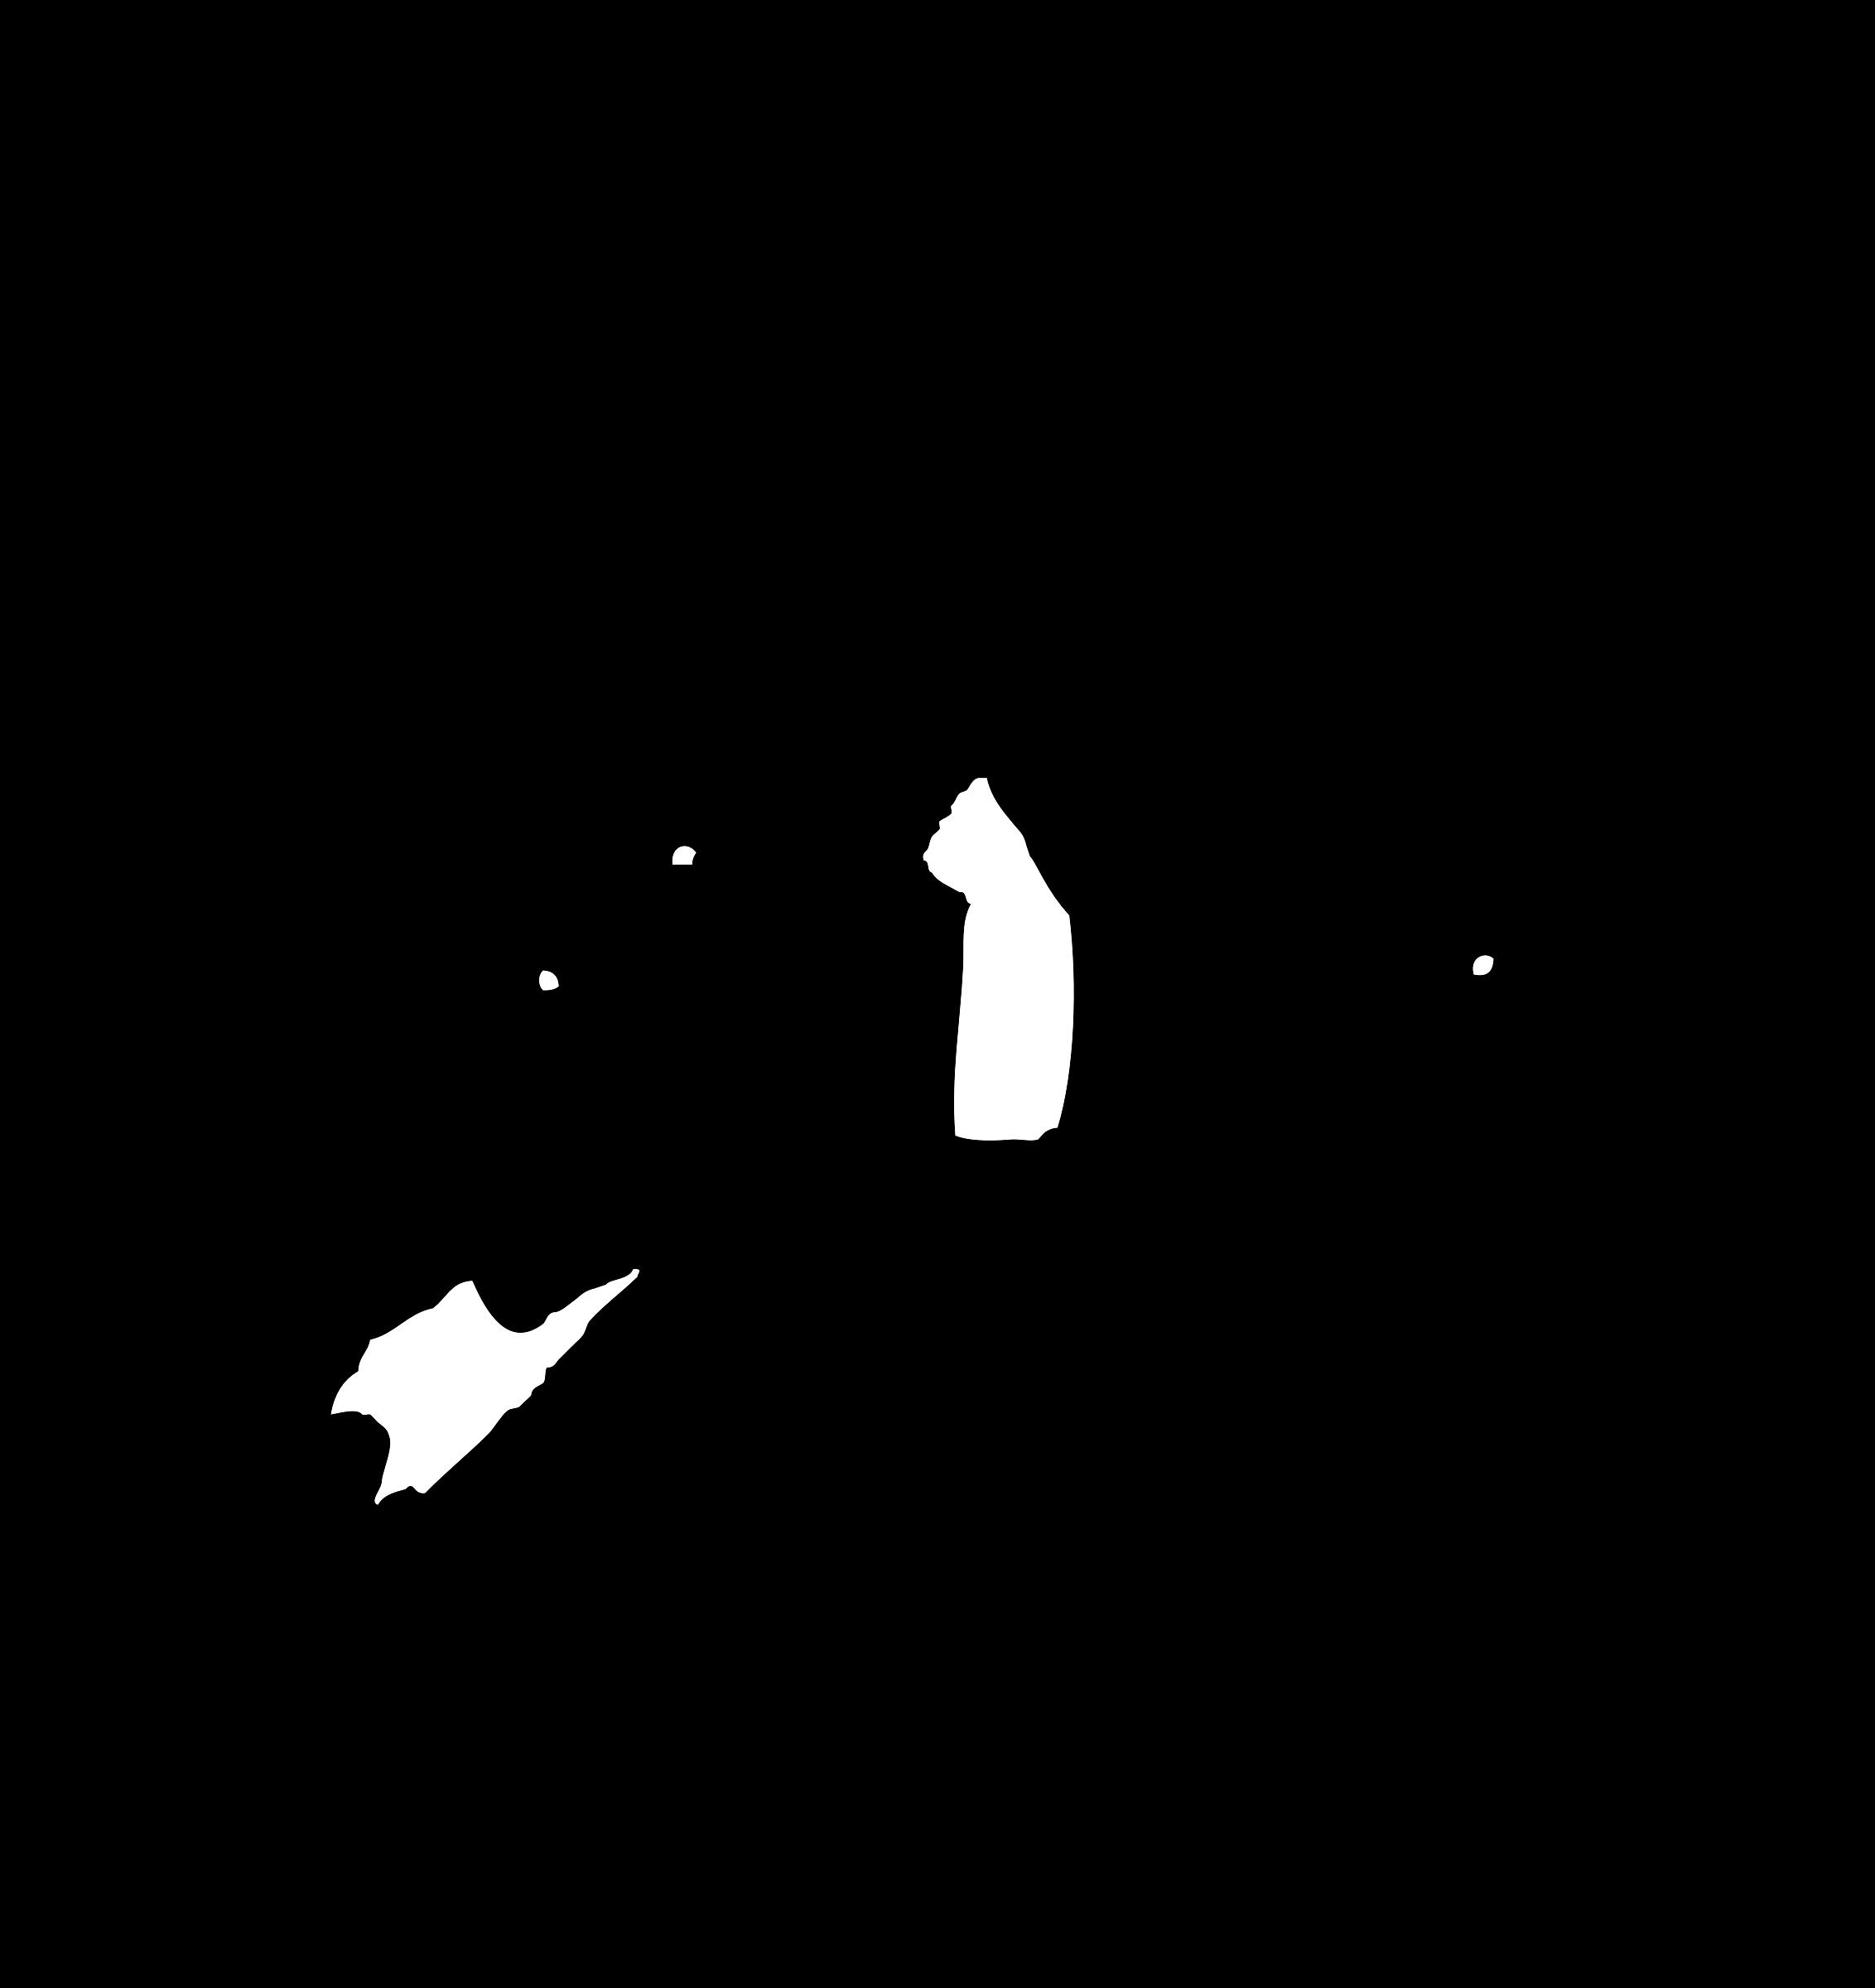 Cat fight clipart image transparent Clipart - cat fight silhouette image transparent